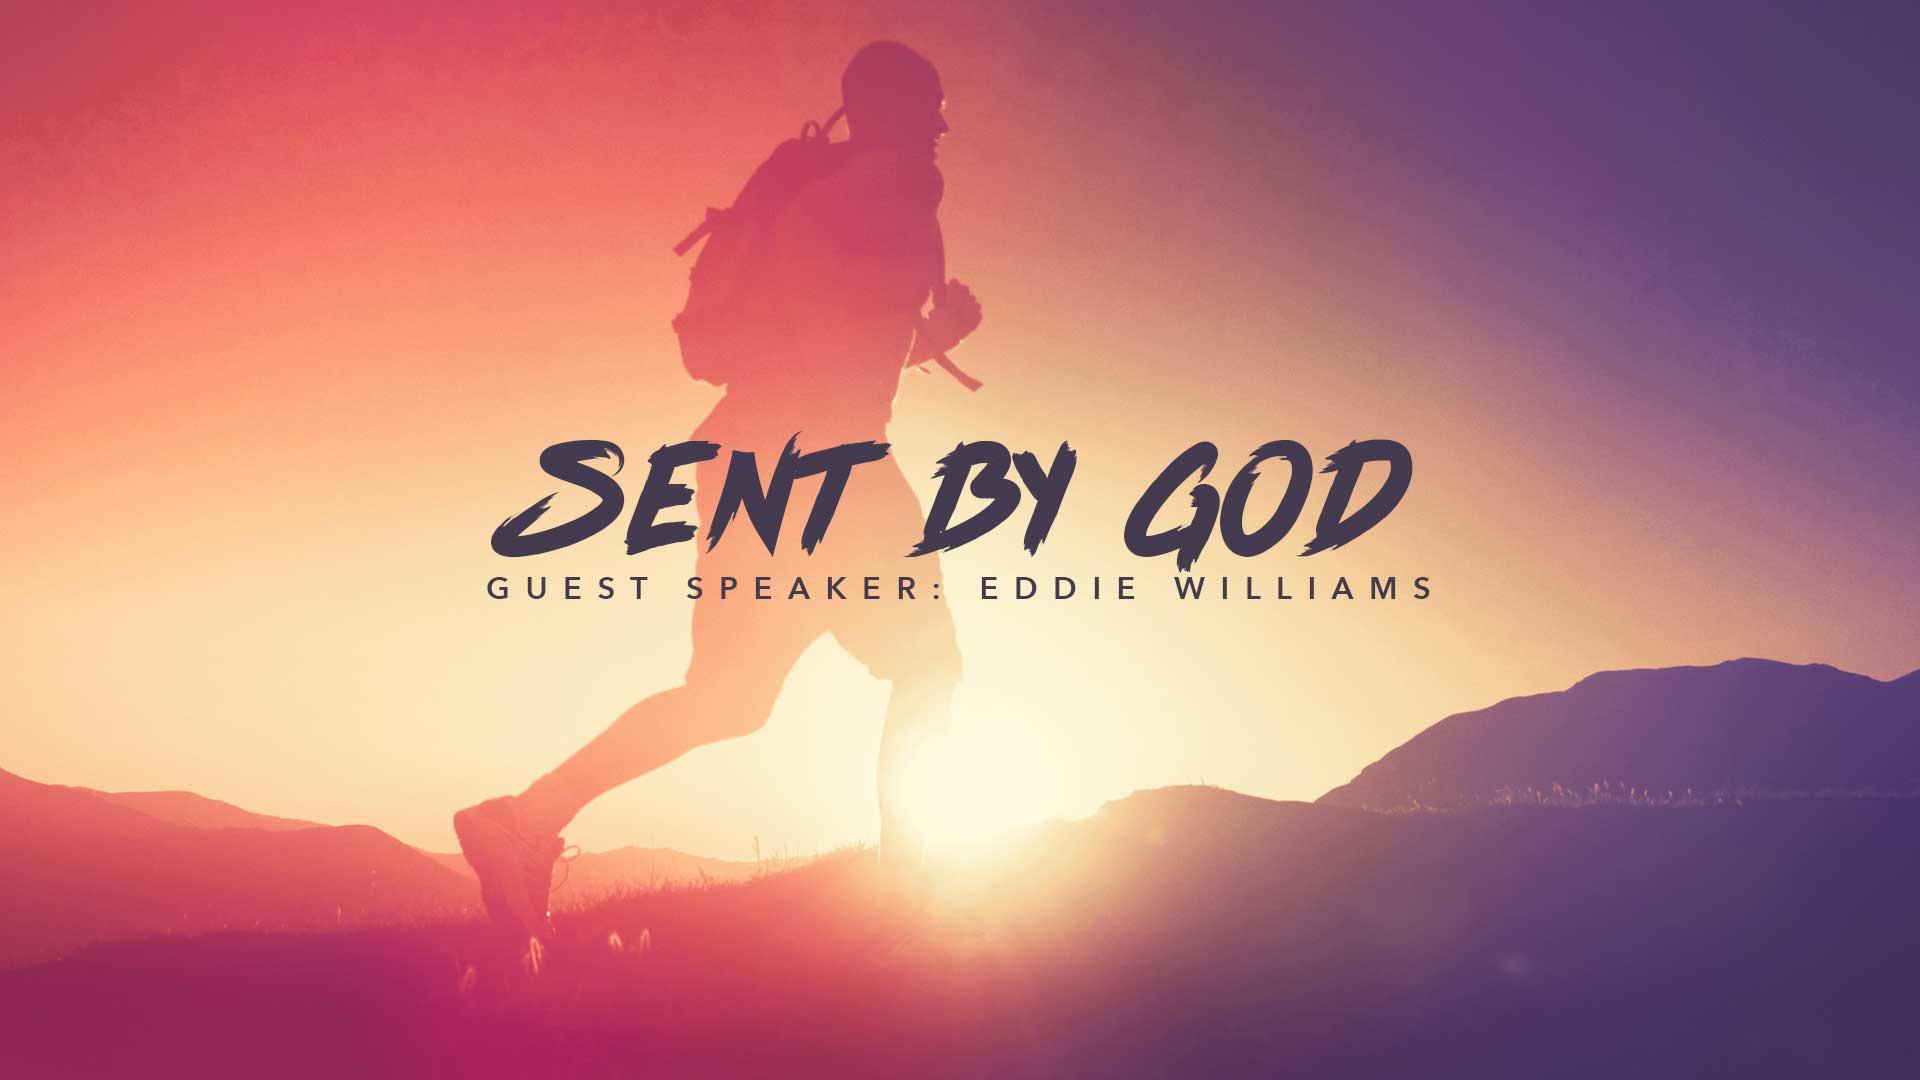 Sent By God